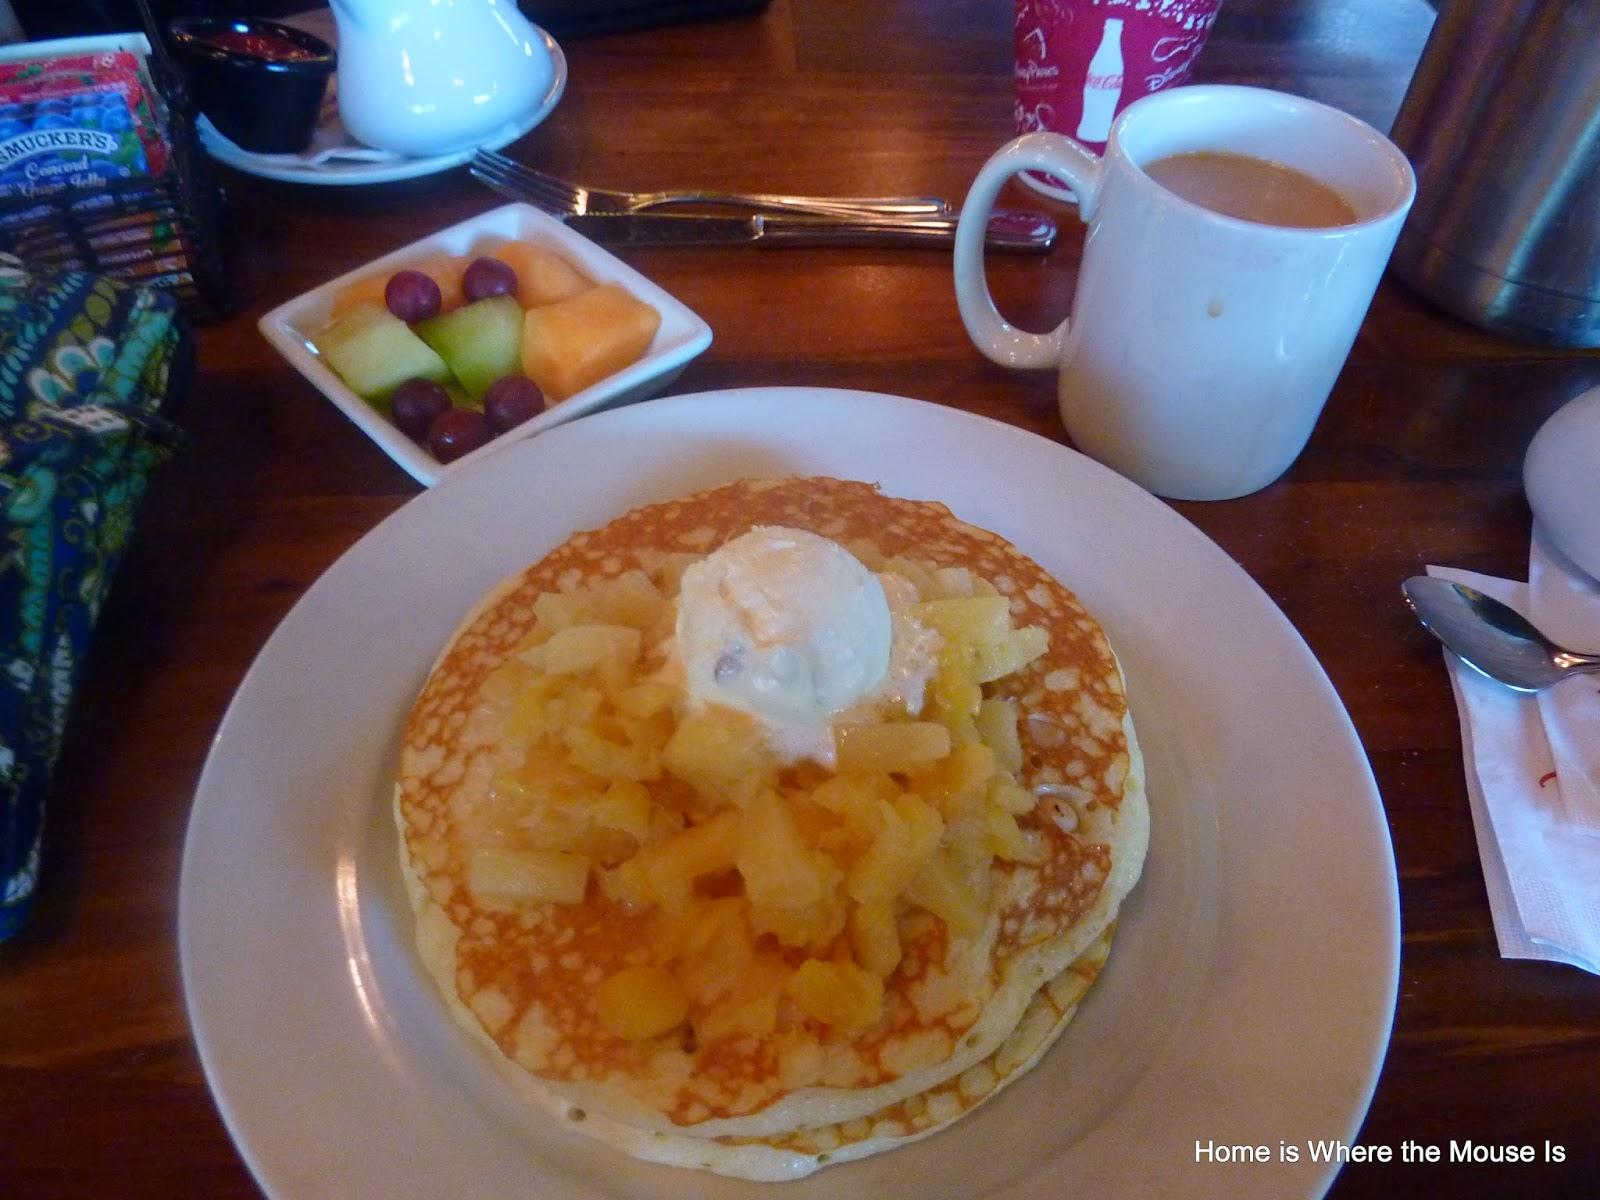 Pineapple Macadamia Nut Pancakes and Kona Coffee from Kona Cafe